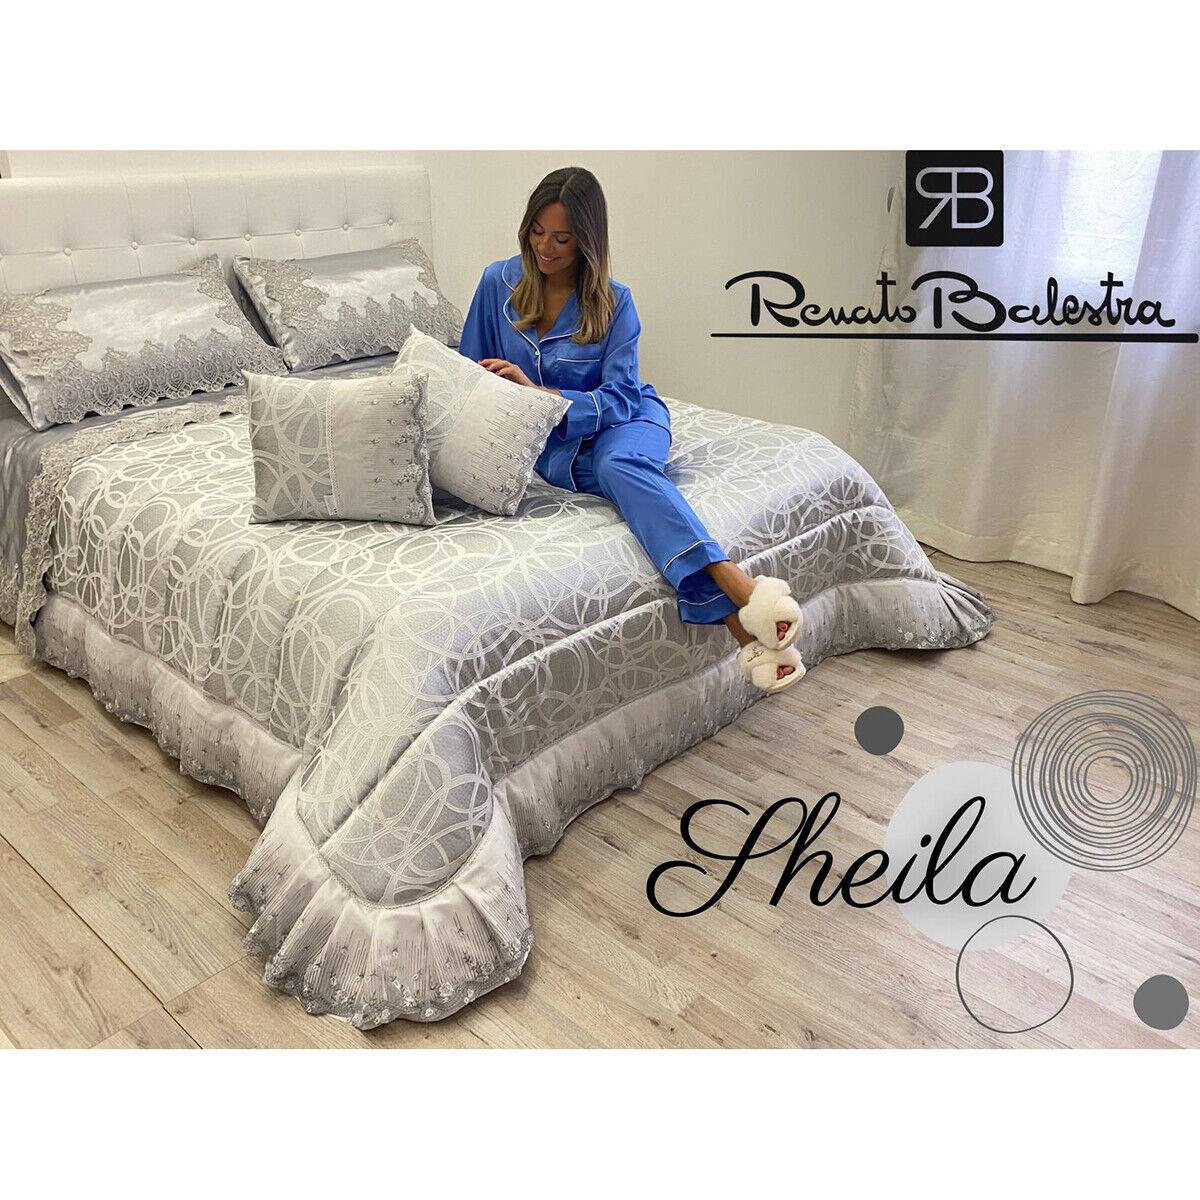 Quilt RENATO BALESTRA Sheila duvet double bed Winter Elegant